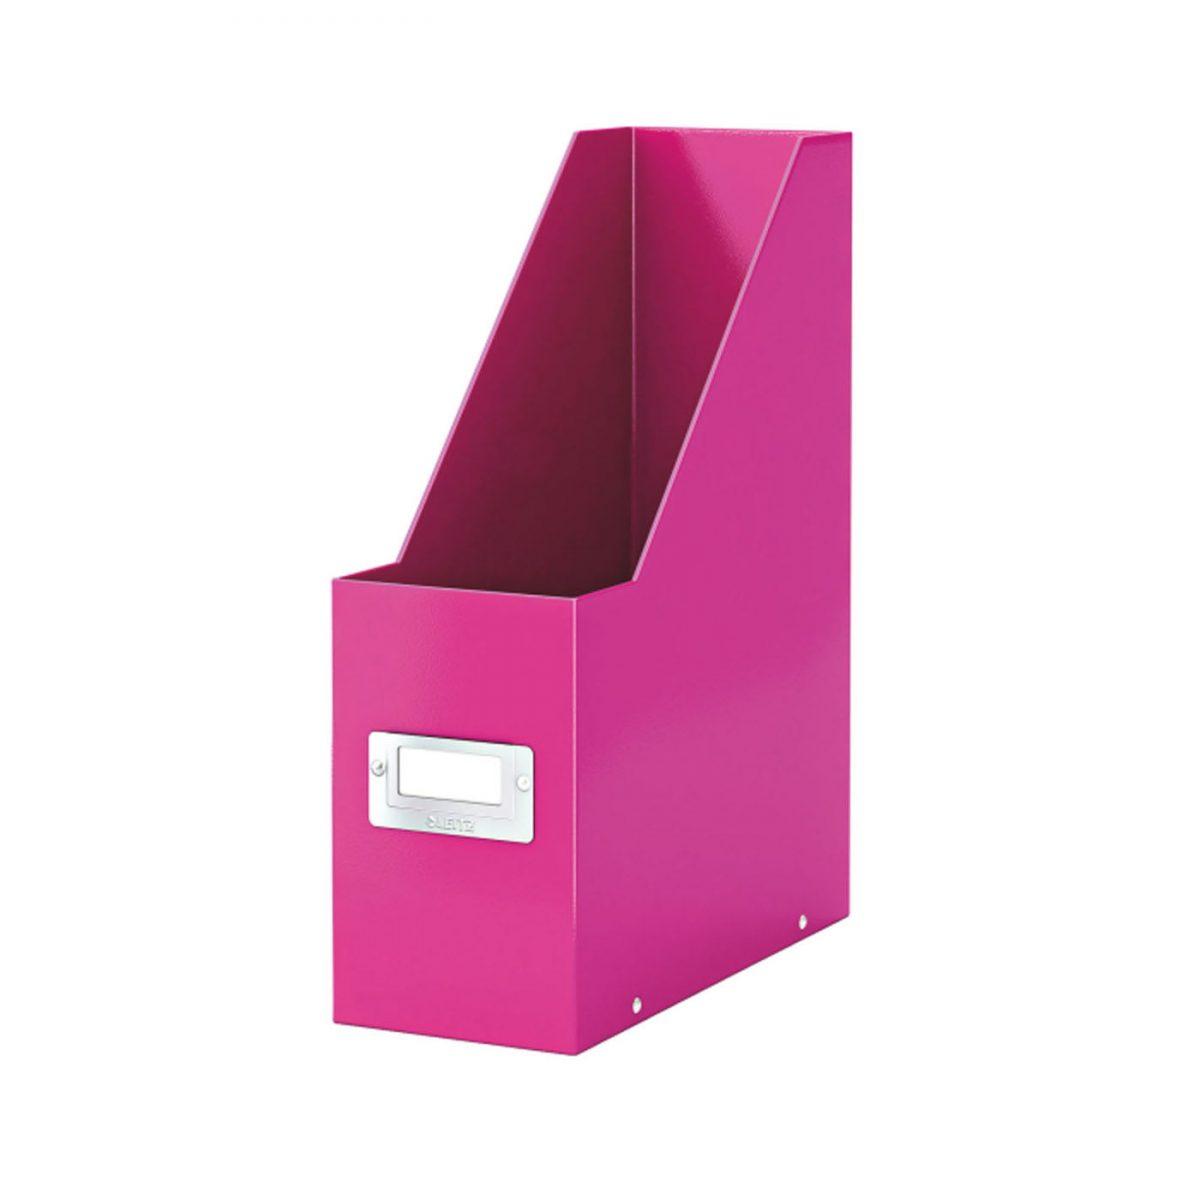 Suport vertical LEITZ Click & Store pentru documente, carton laminat - roz